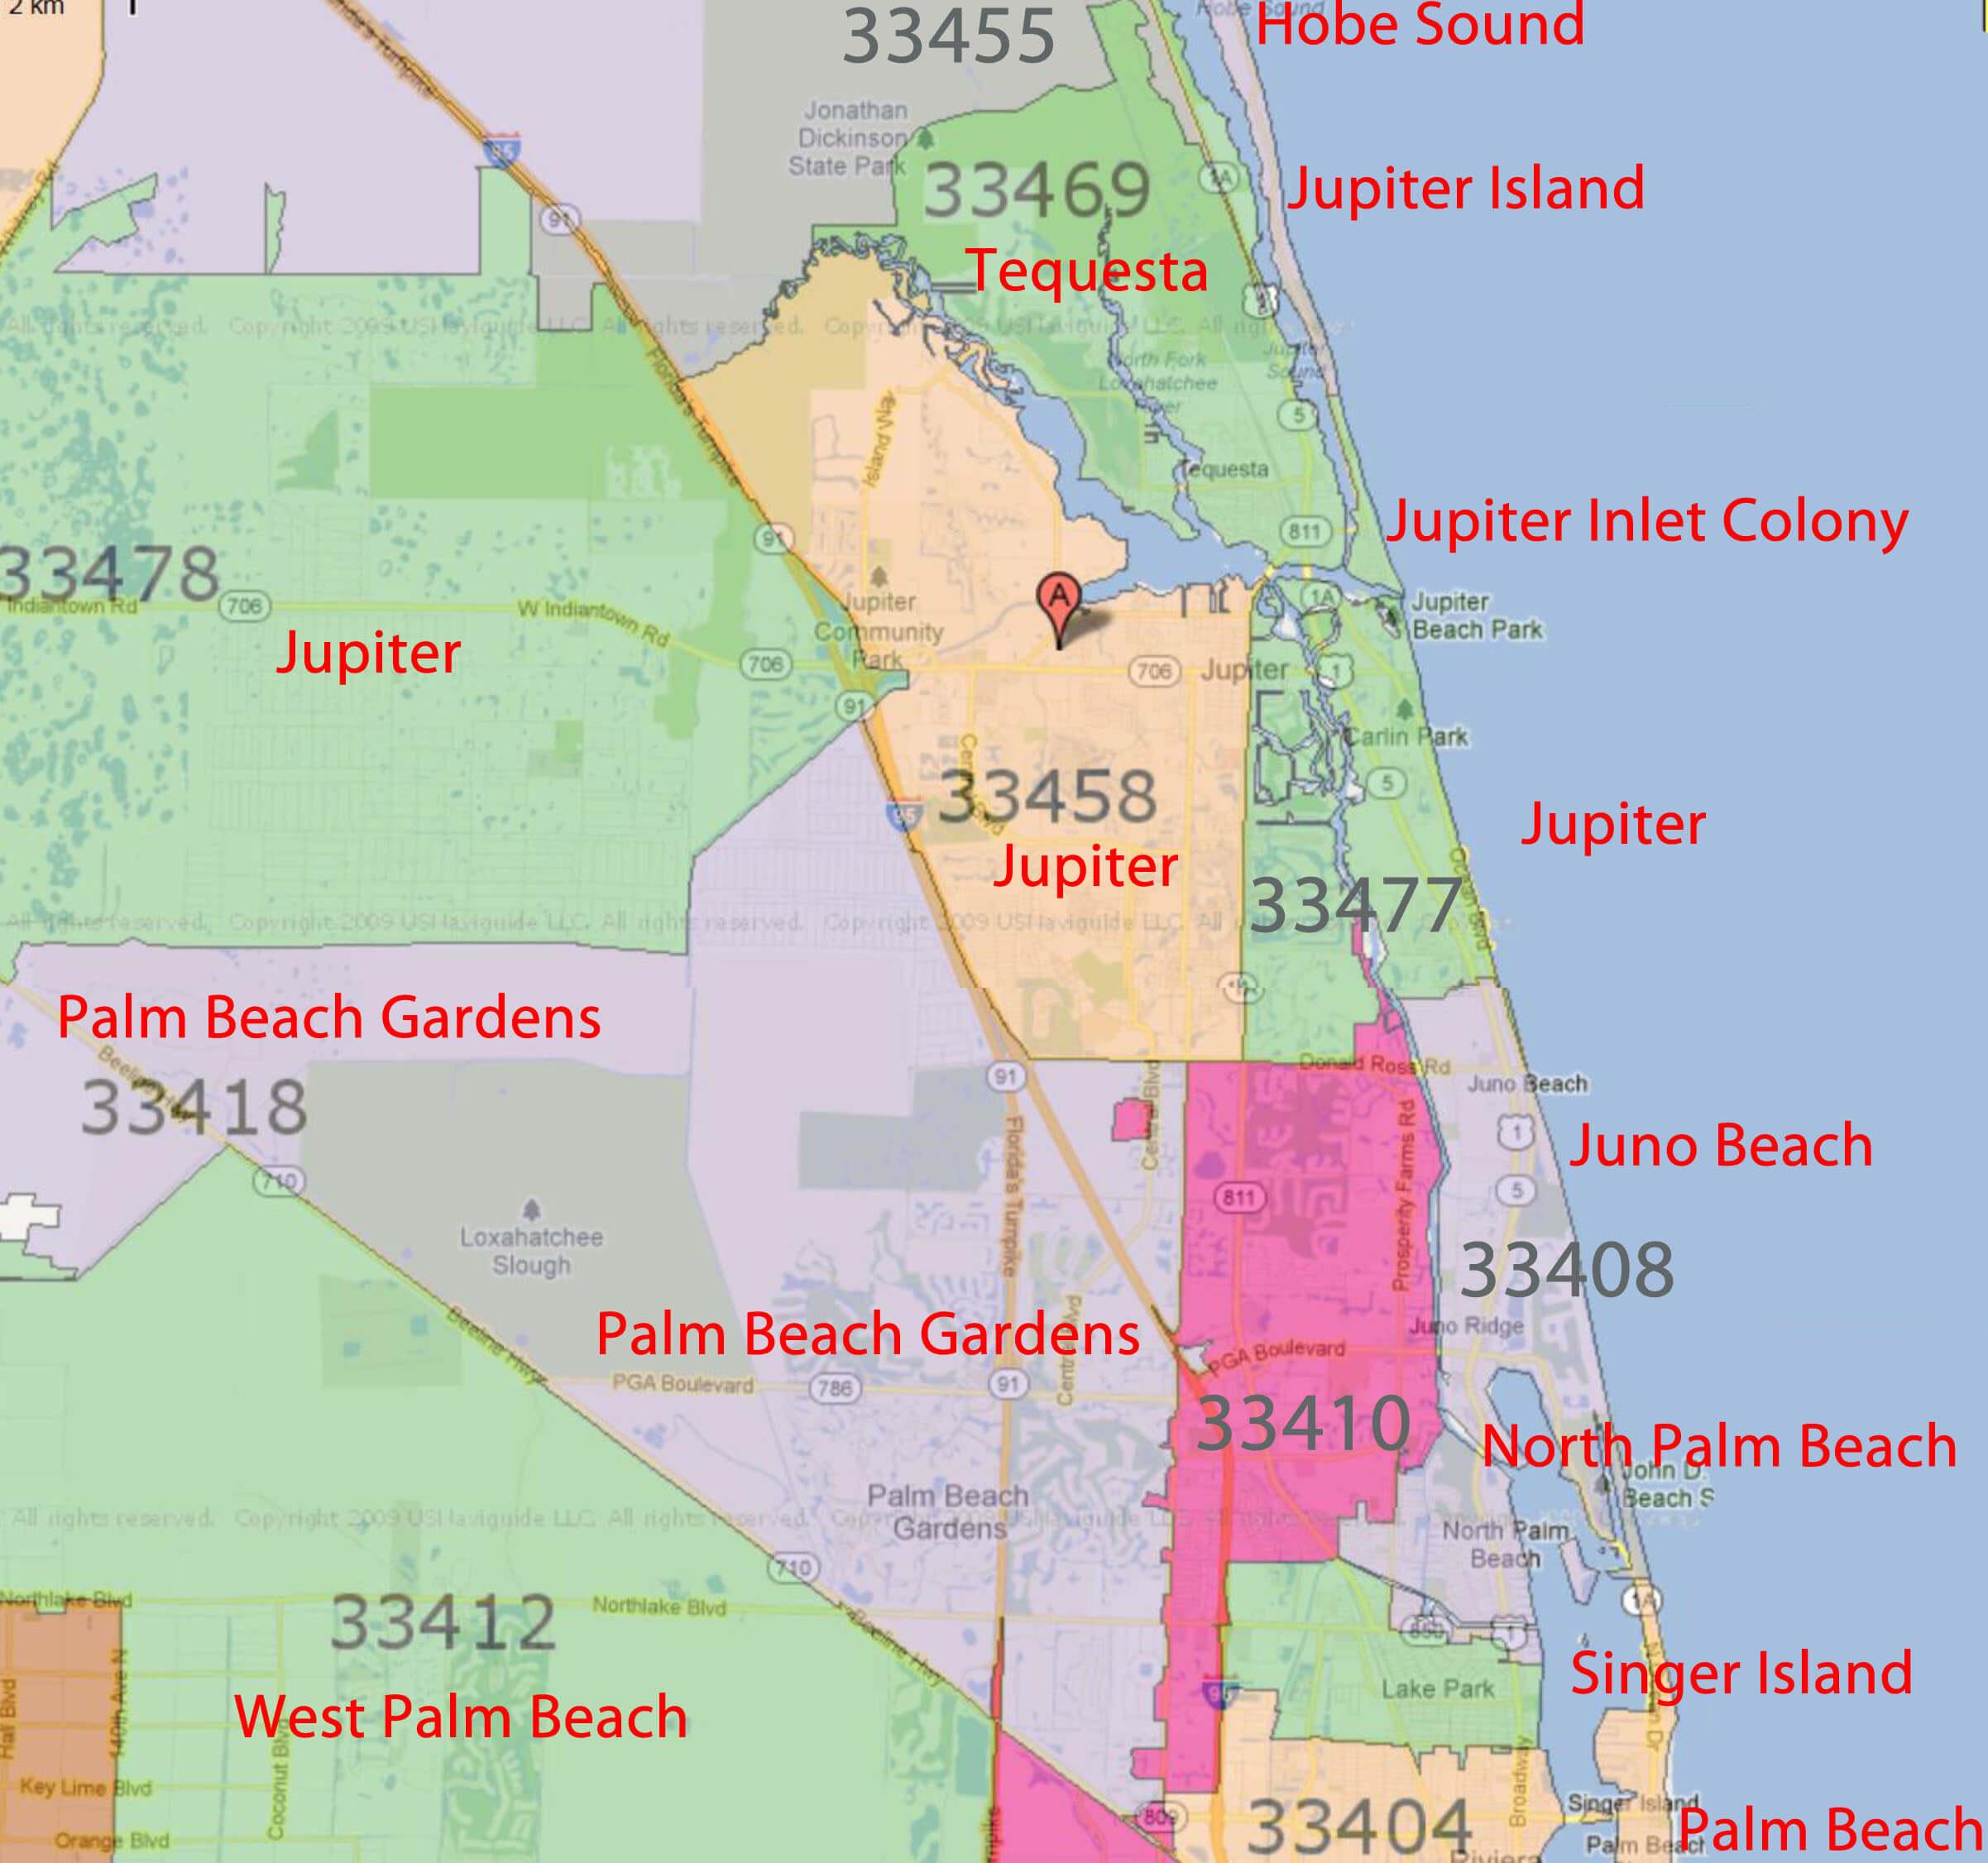 Palm Beach Gardens, Jupiter Florida Real Estatezip Code - Google Maps Jupiter Florida